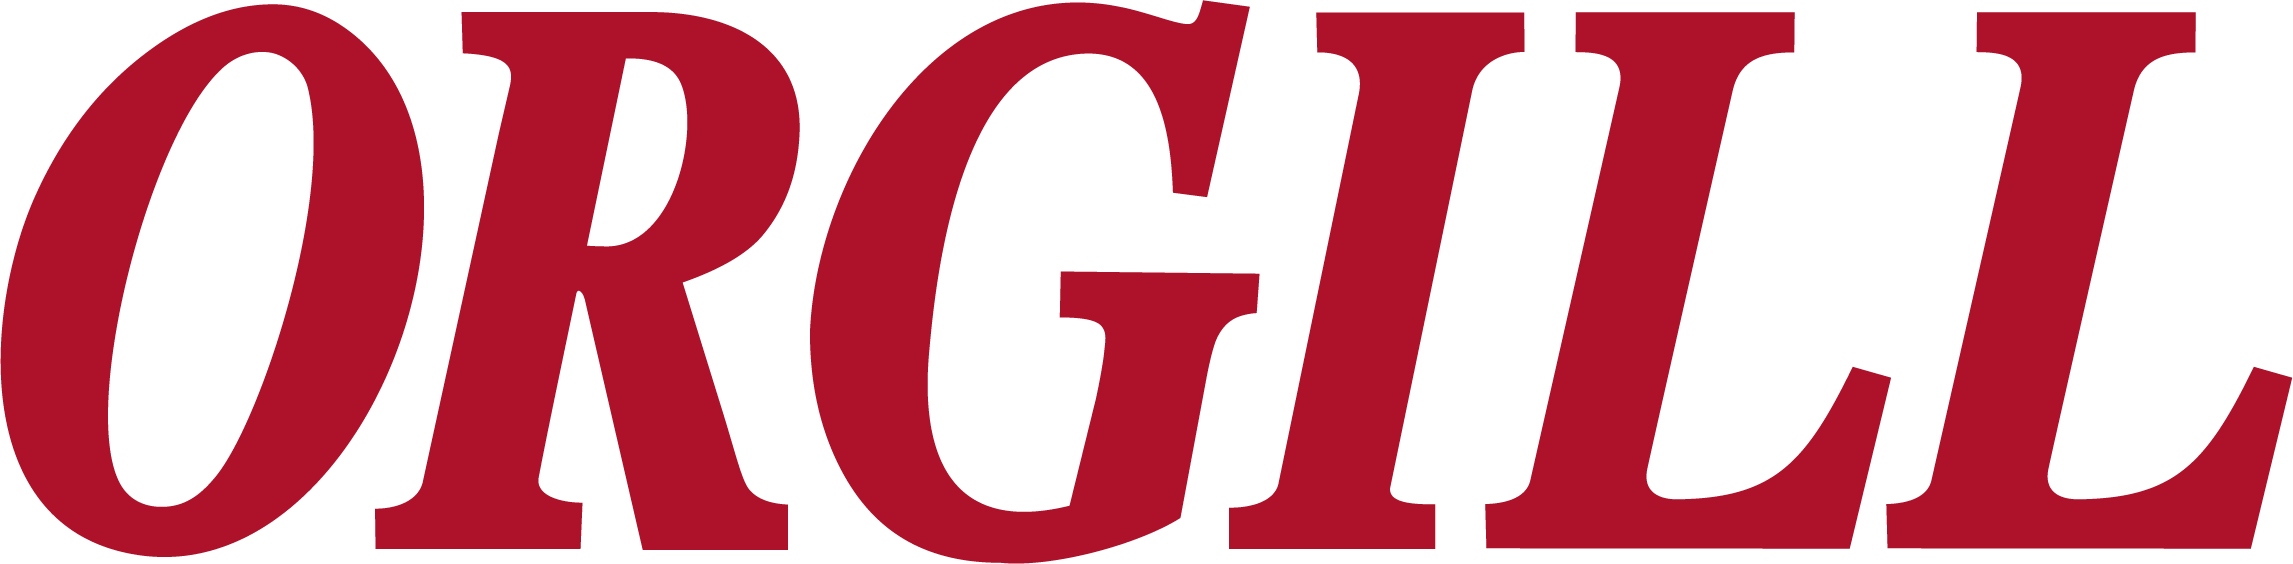 Cantrell Gainco, Gainesville, GA